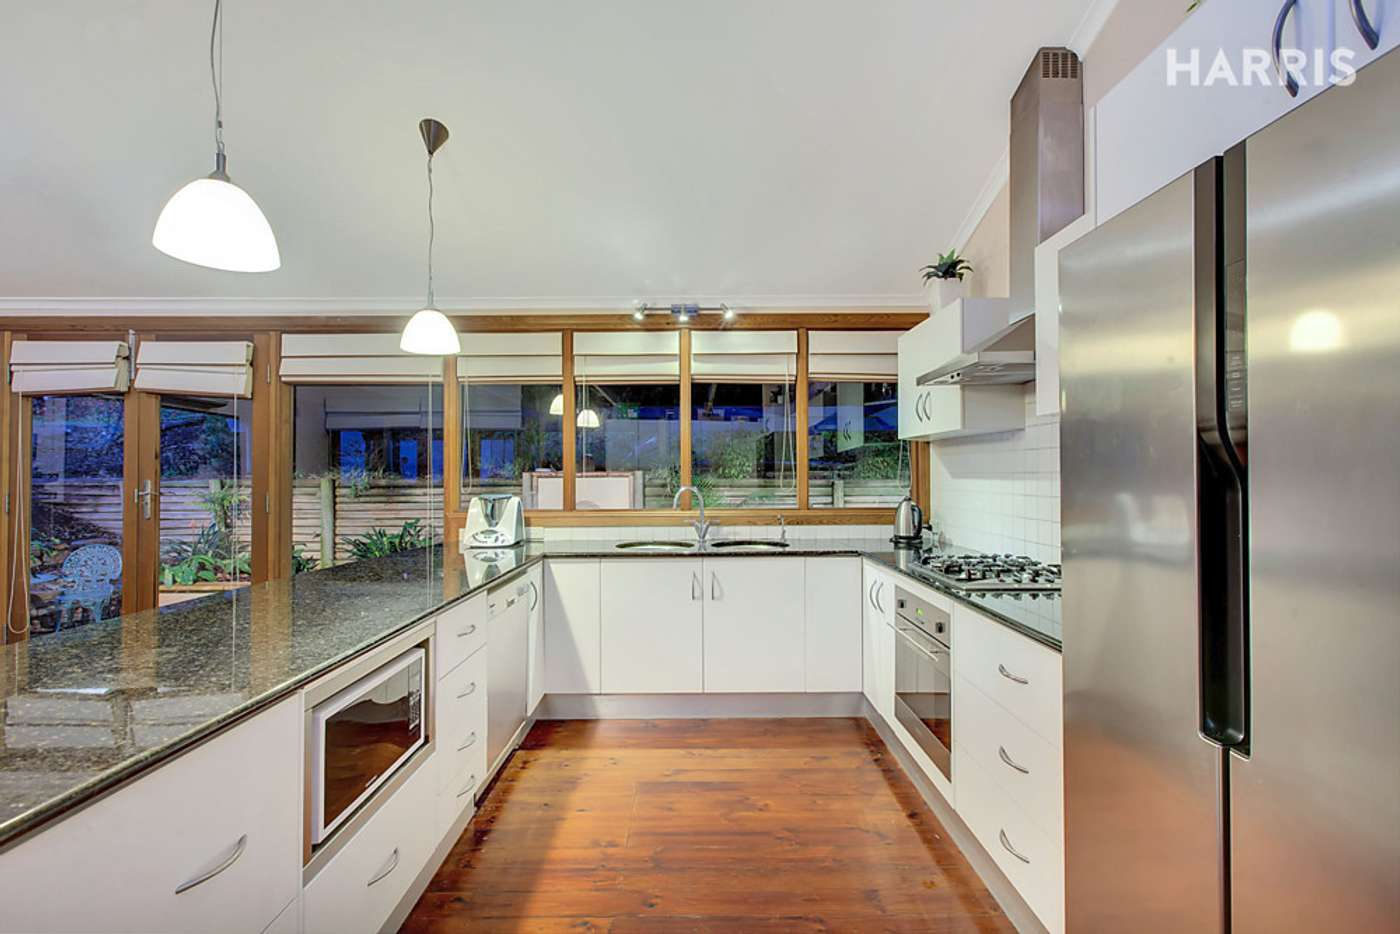 Main view of Homely house listing, 21 Karkoo Street, Seaview Downs SA 5049